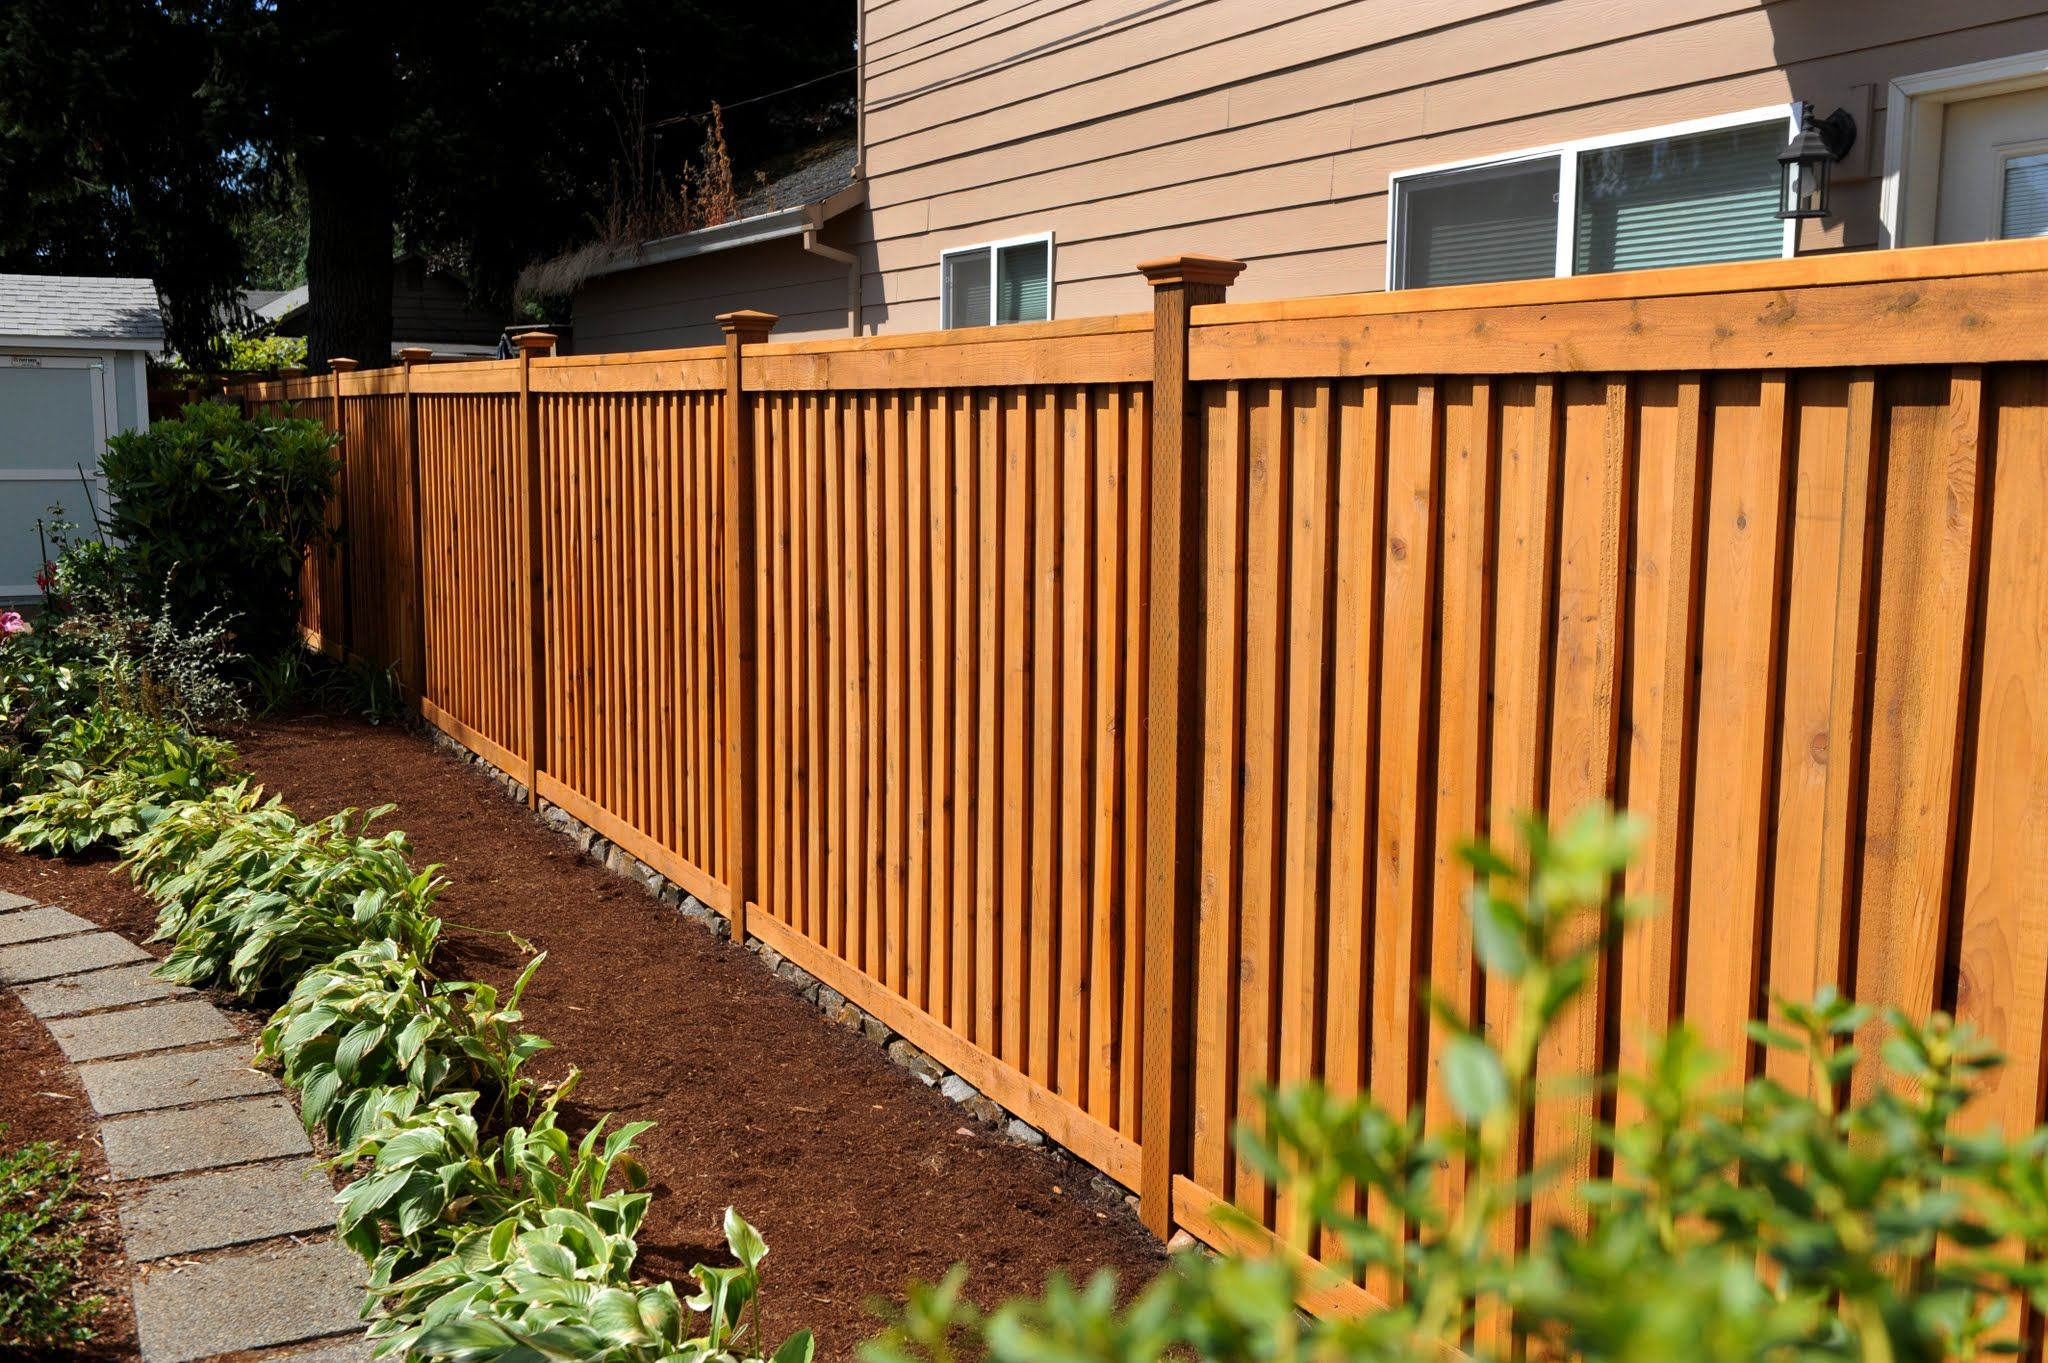 Cedar Wood Fences Oregon Washington Rick S Custom Fencing Decking Cedar Wood Fence Wood Fence Design House Fence Design